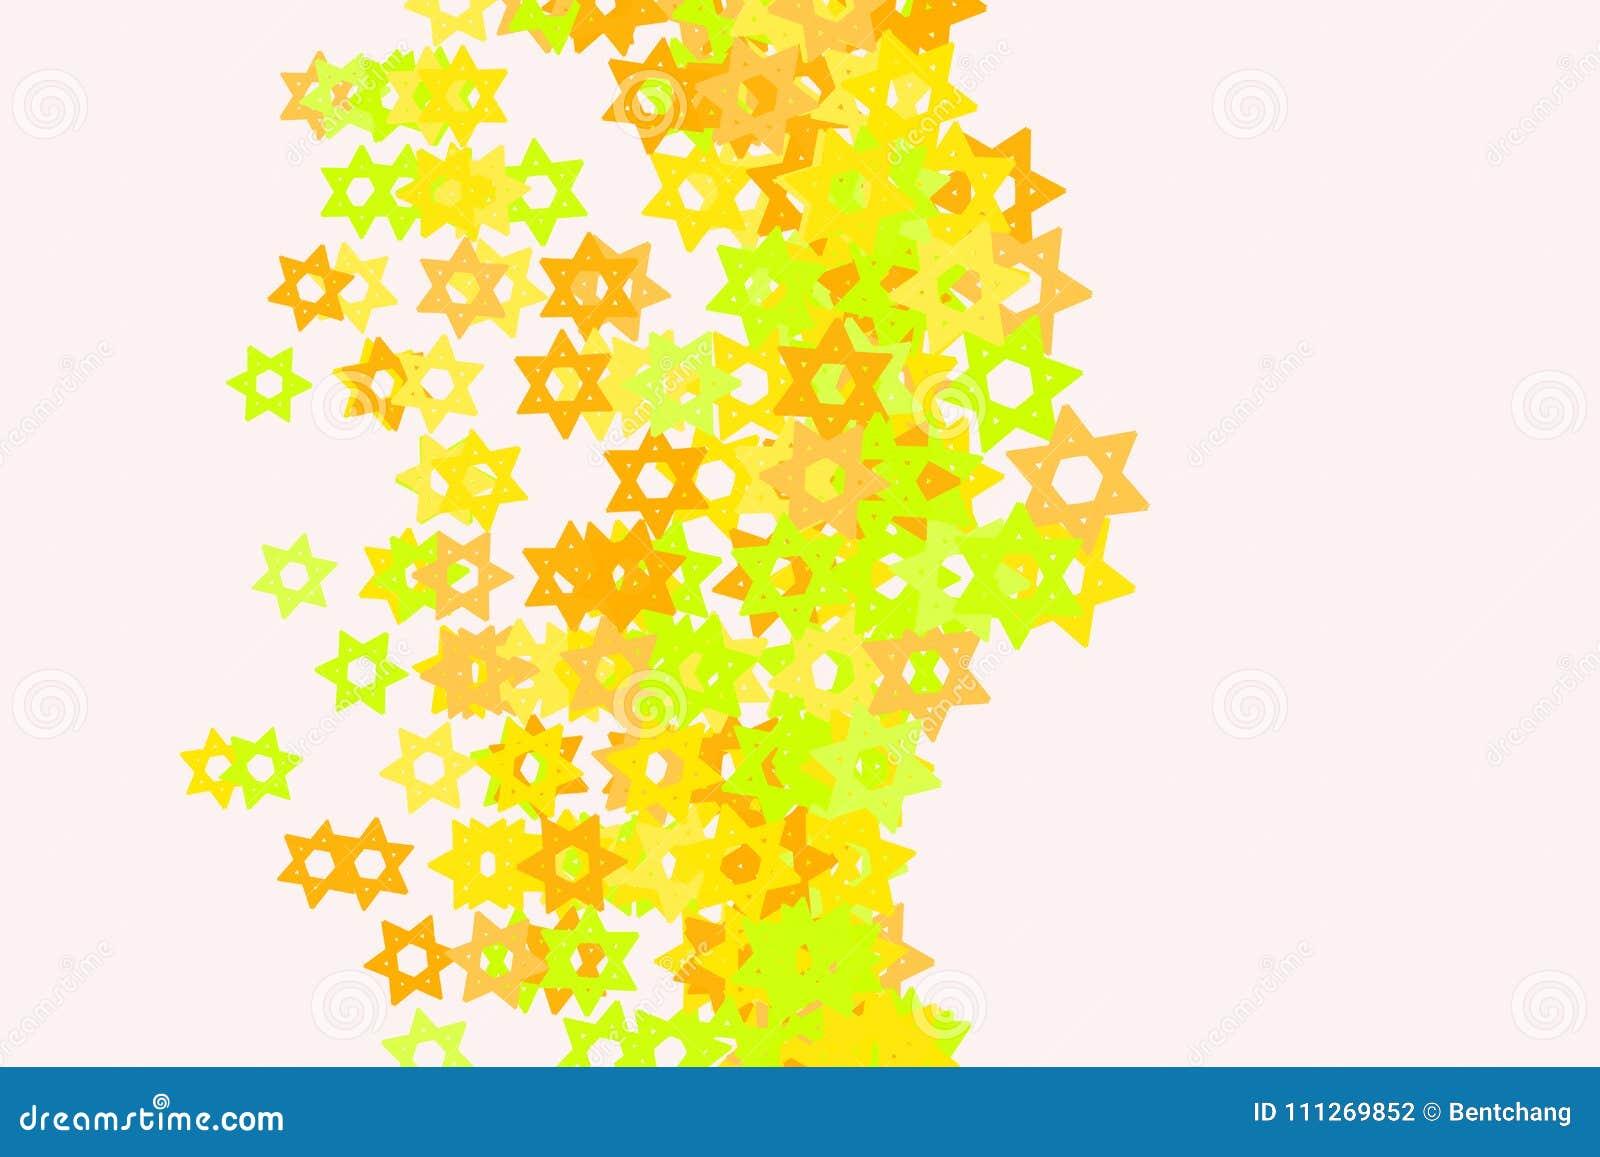 modern geometrical star background pattern abstract shape white